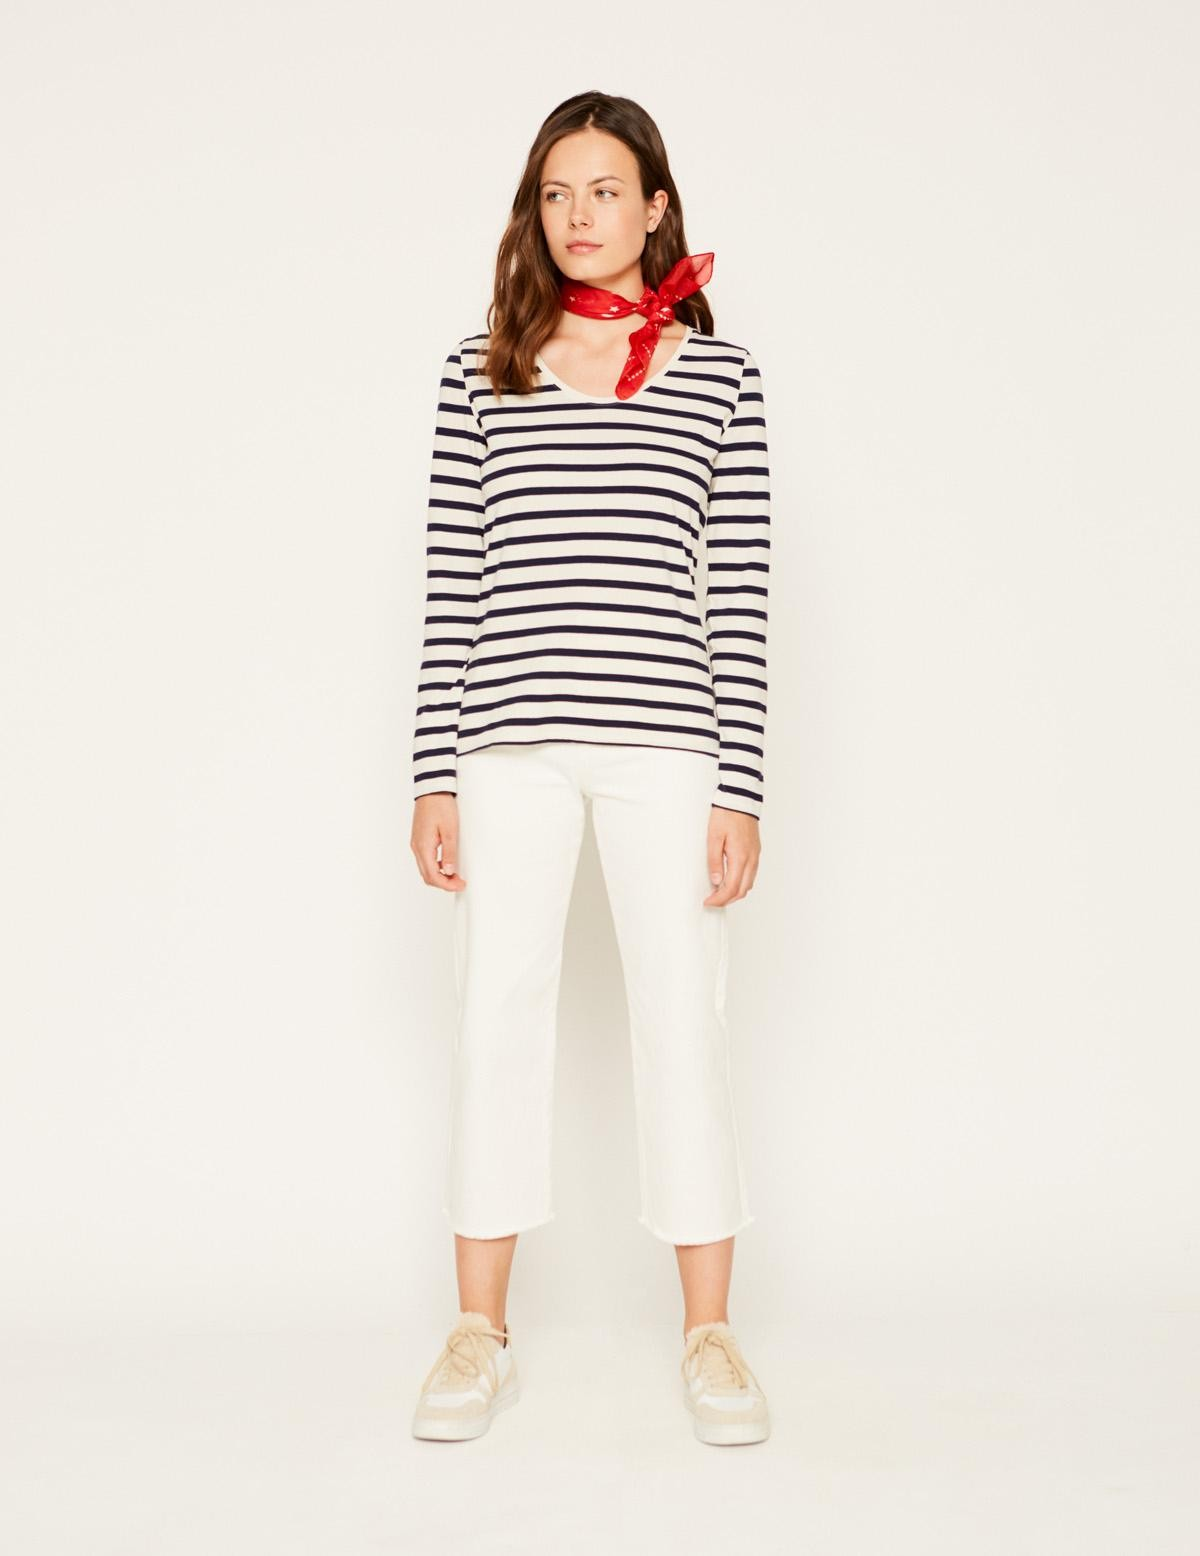 Camiseta rayas marineras - Ítem1